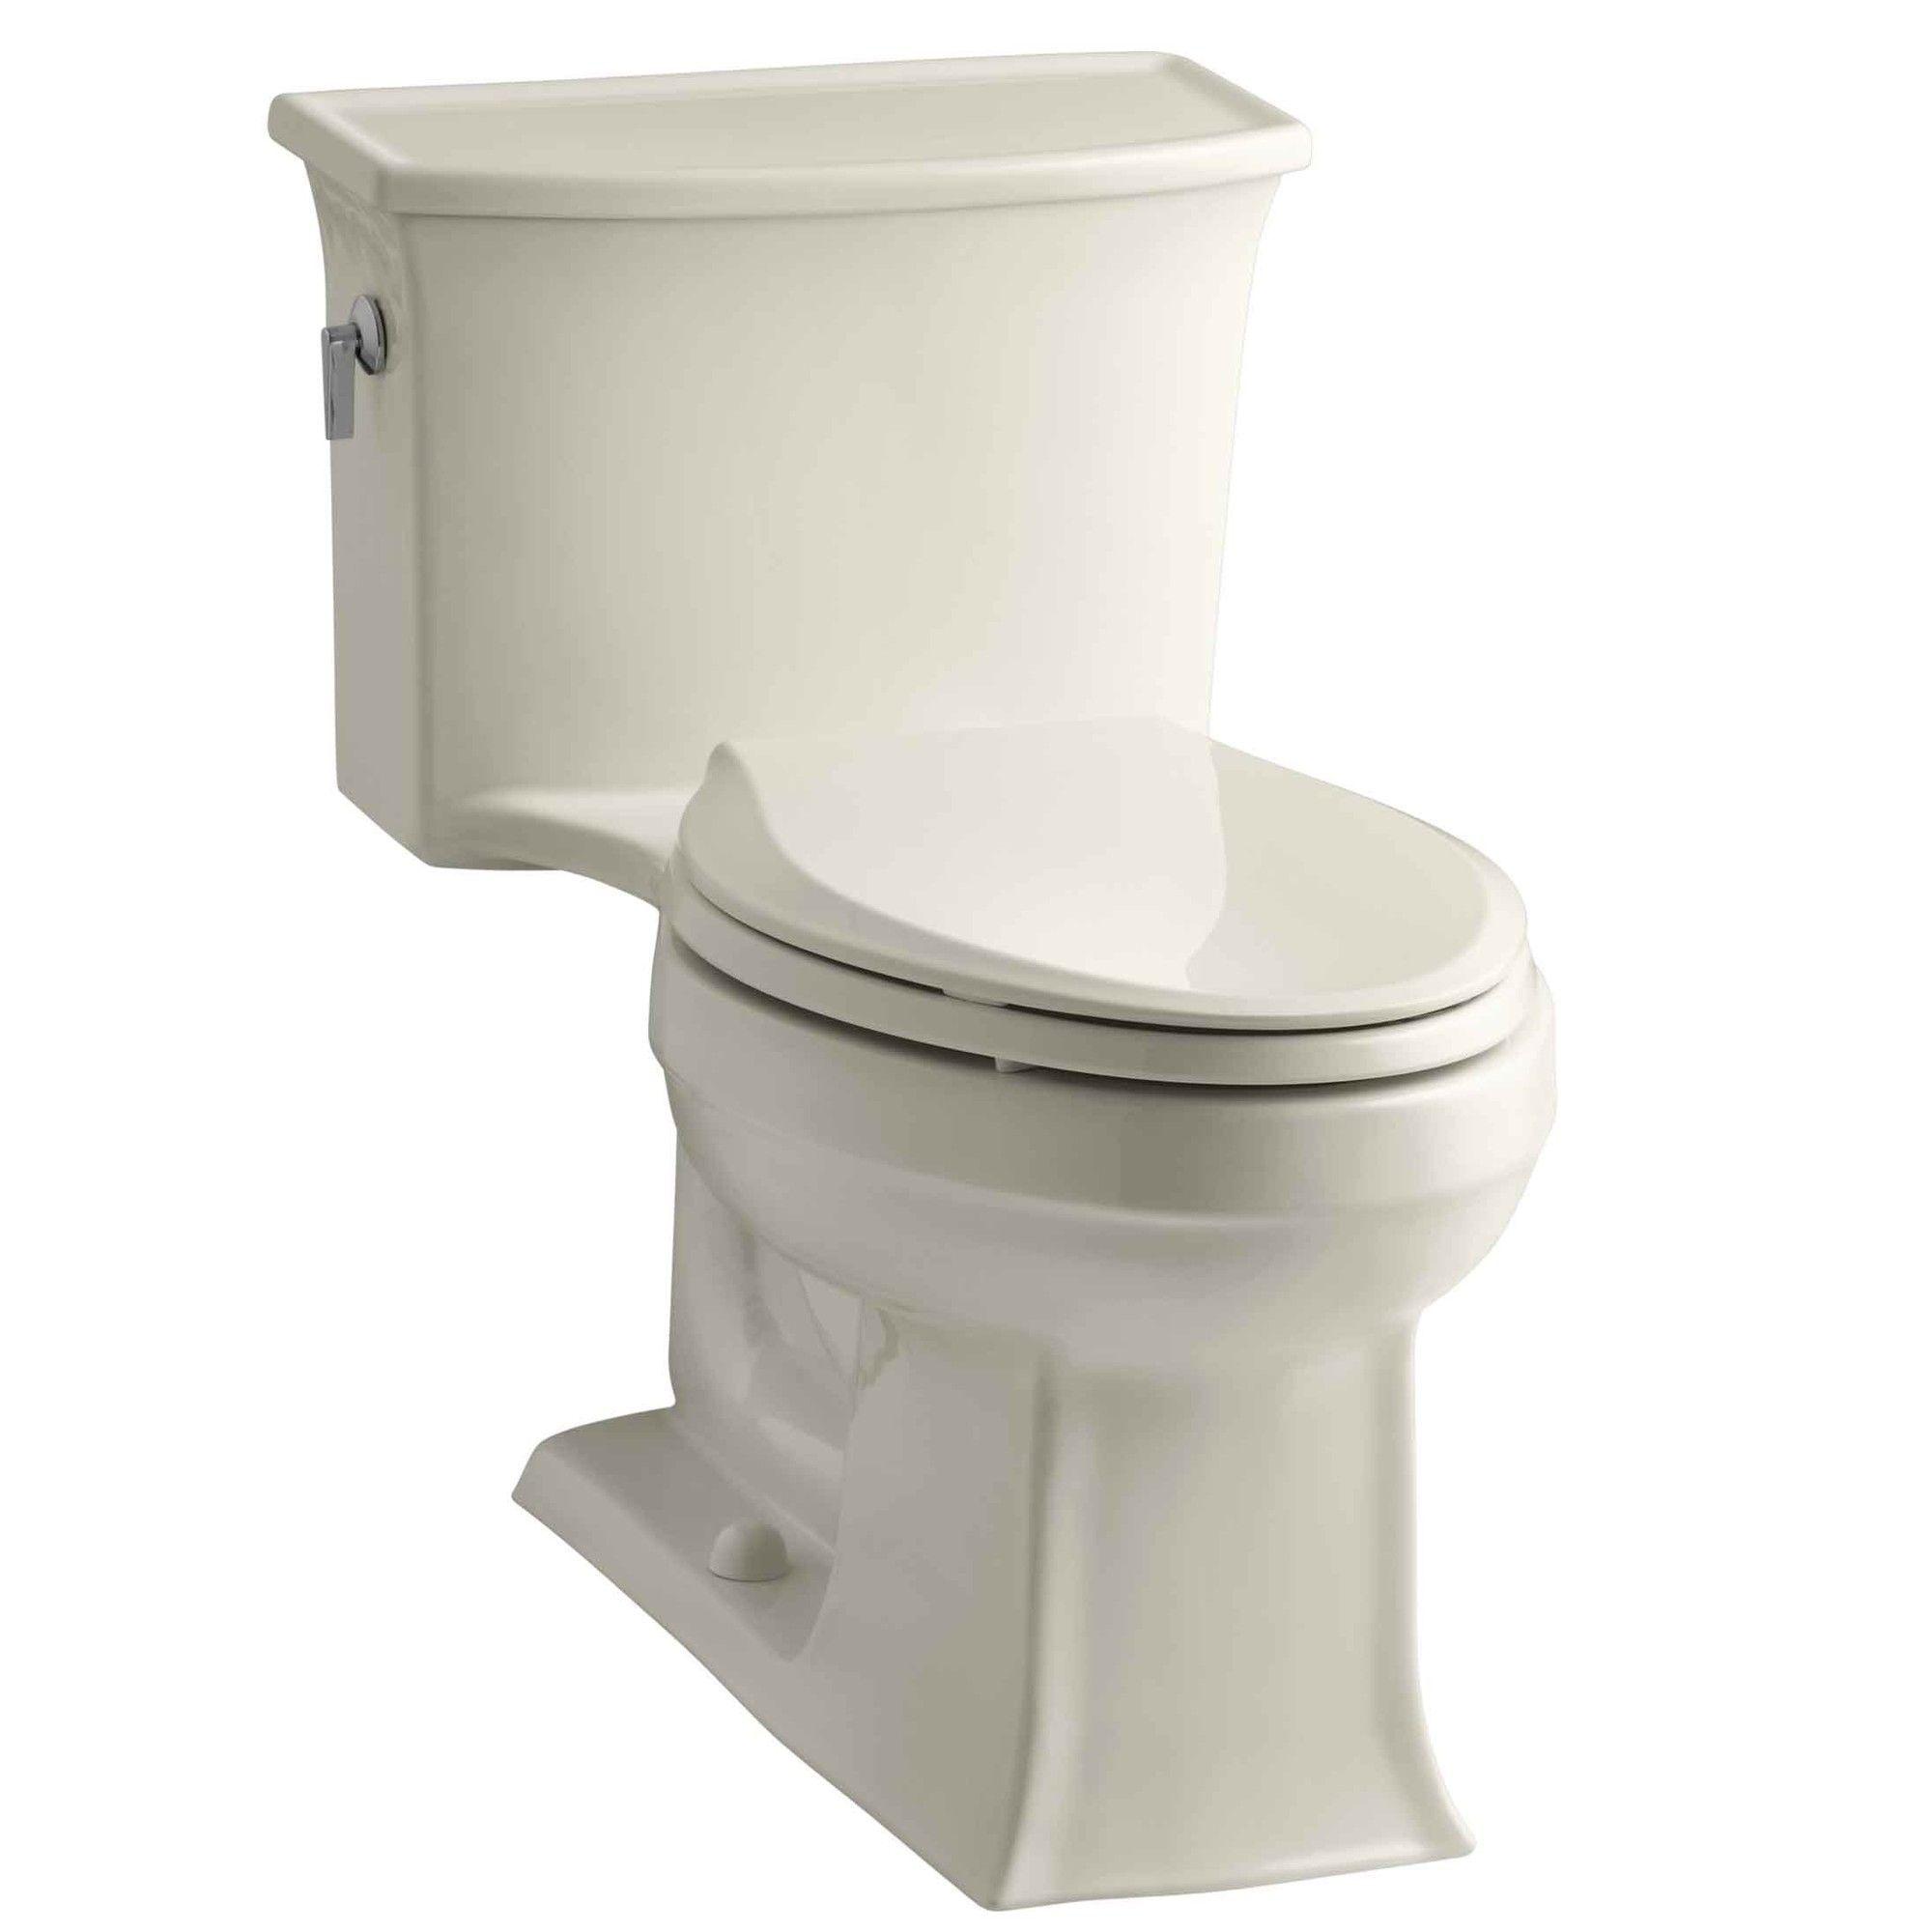 Kohler Archer Trip Toilet Lever